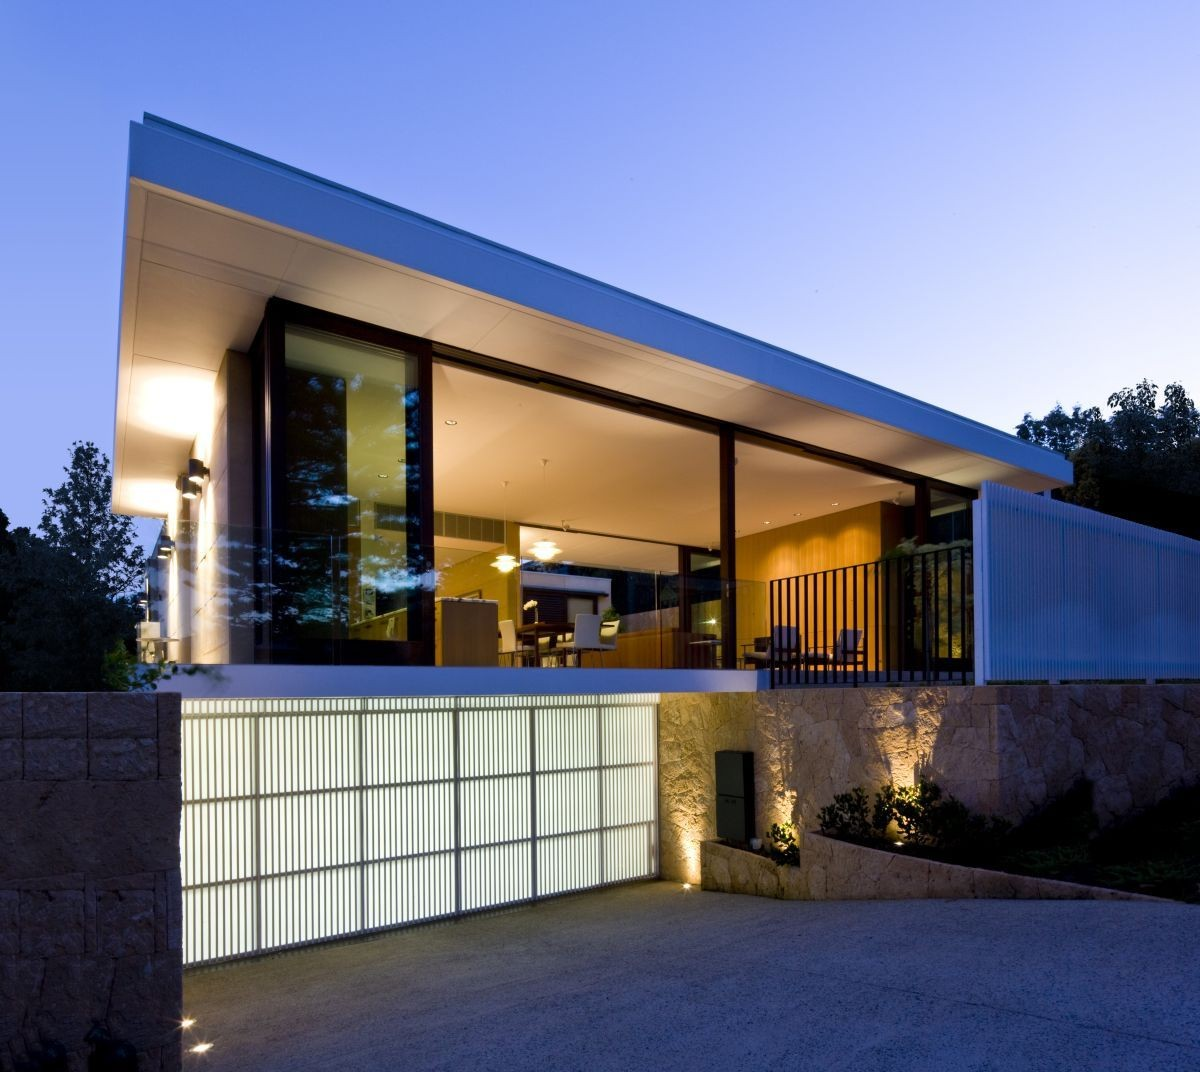 Residencia Calle Salvado / Bates Smart Architects, © Tyrone Branigan